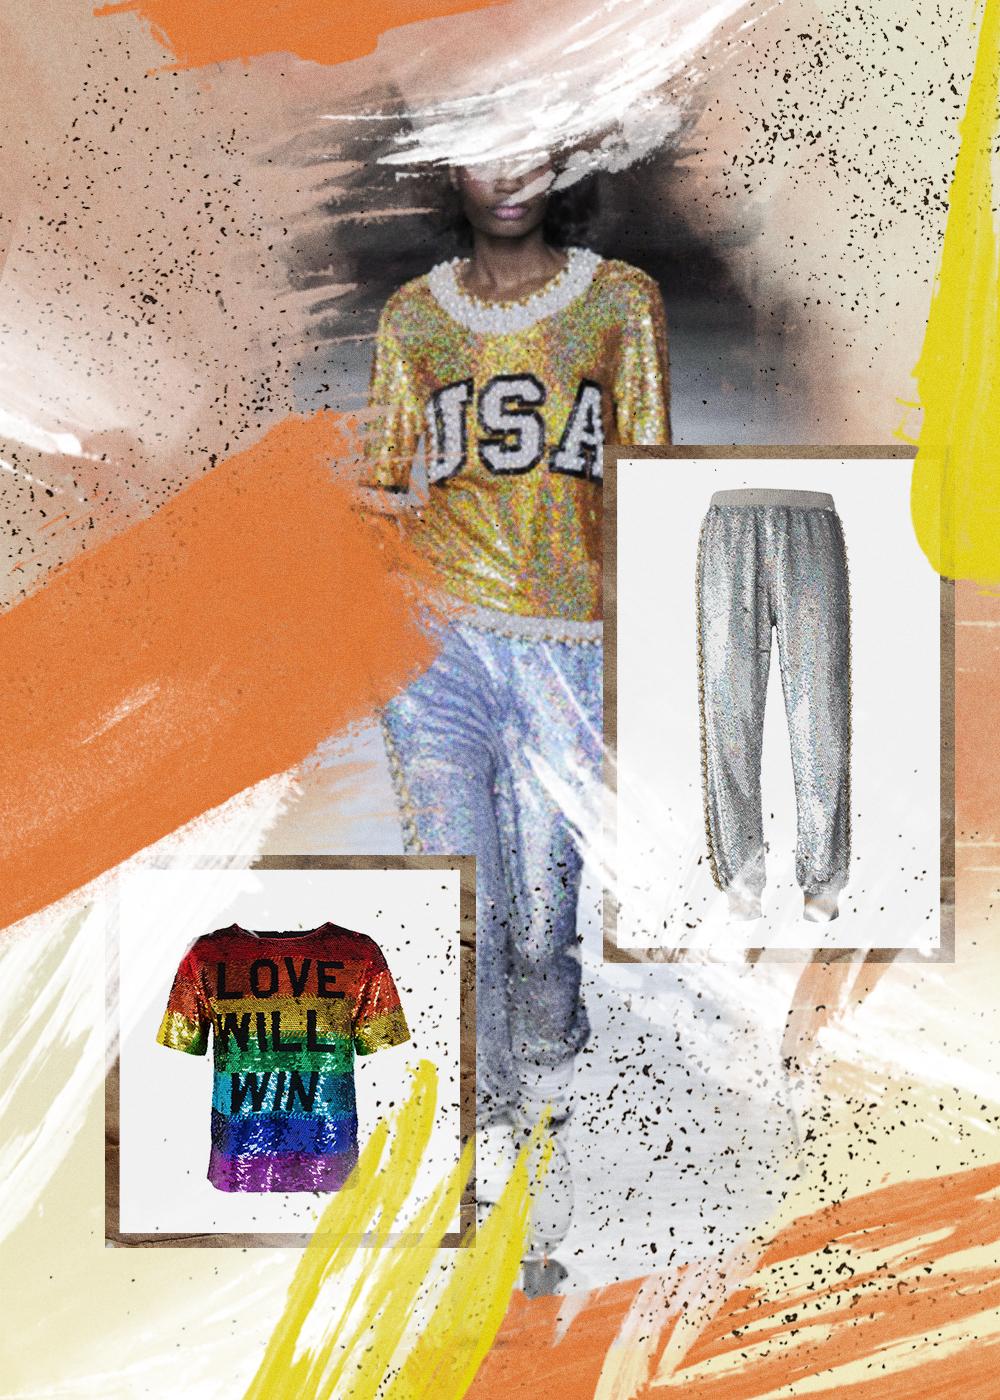 Maison-Mittweg-Designers-Ashish-Sequin-Tees-Tracksuit